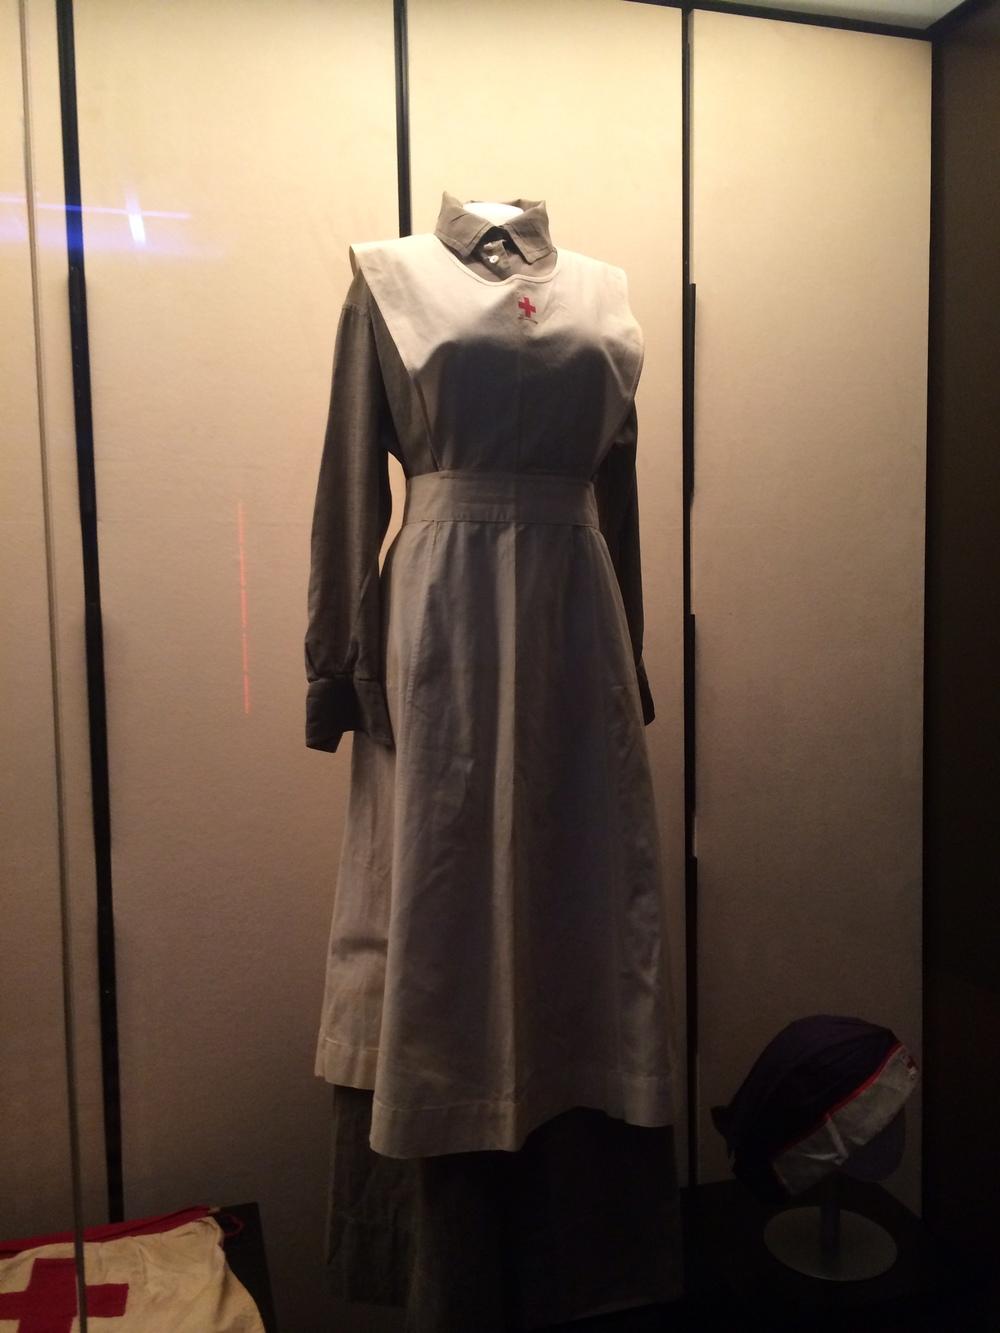 World War I Red Cross nurse's uniform taken at the National World War I Museum in Kansas City